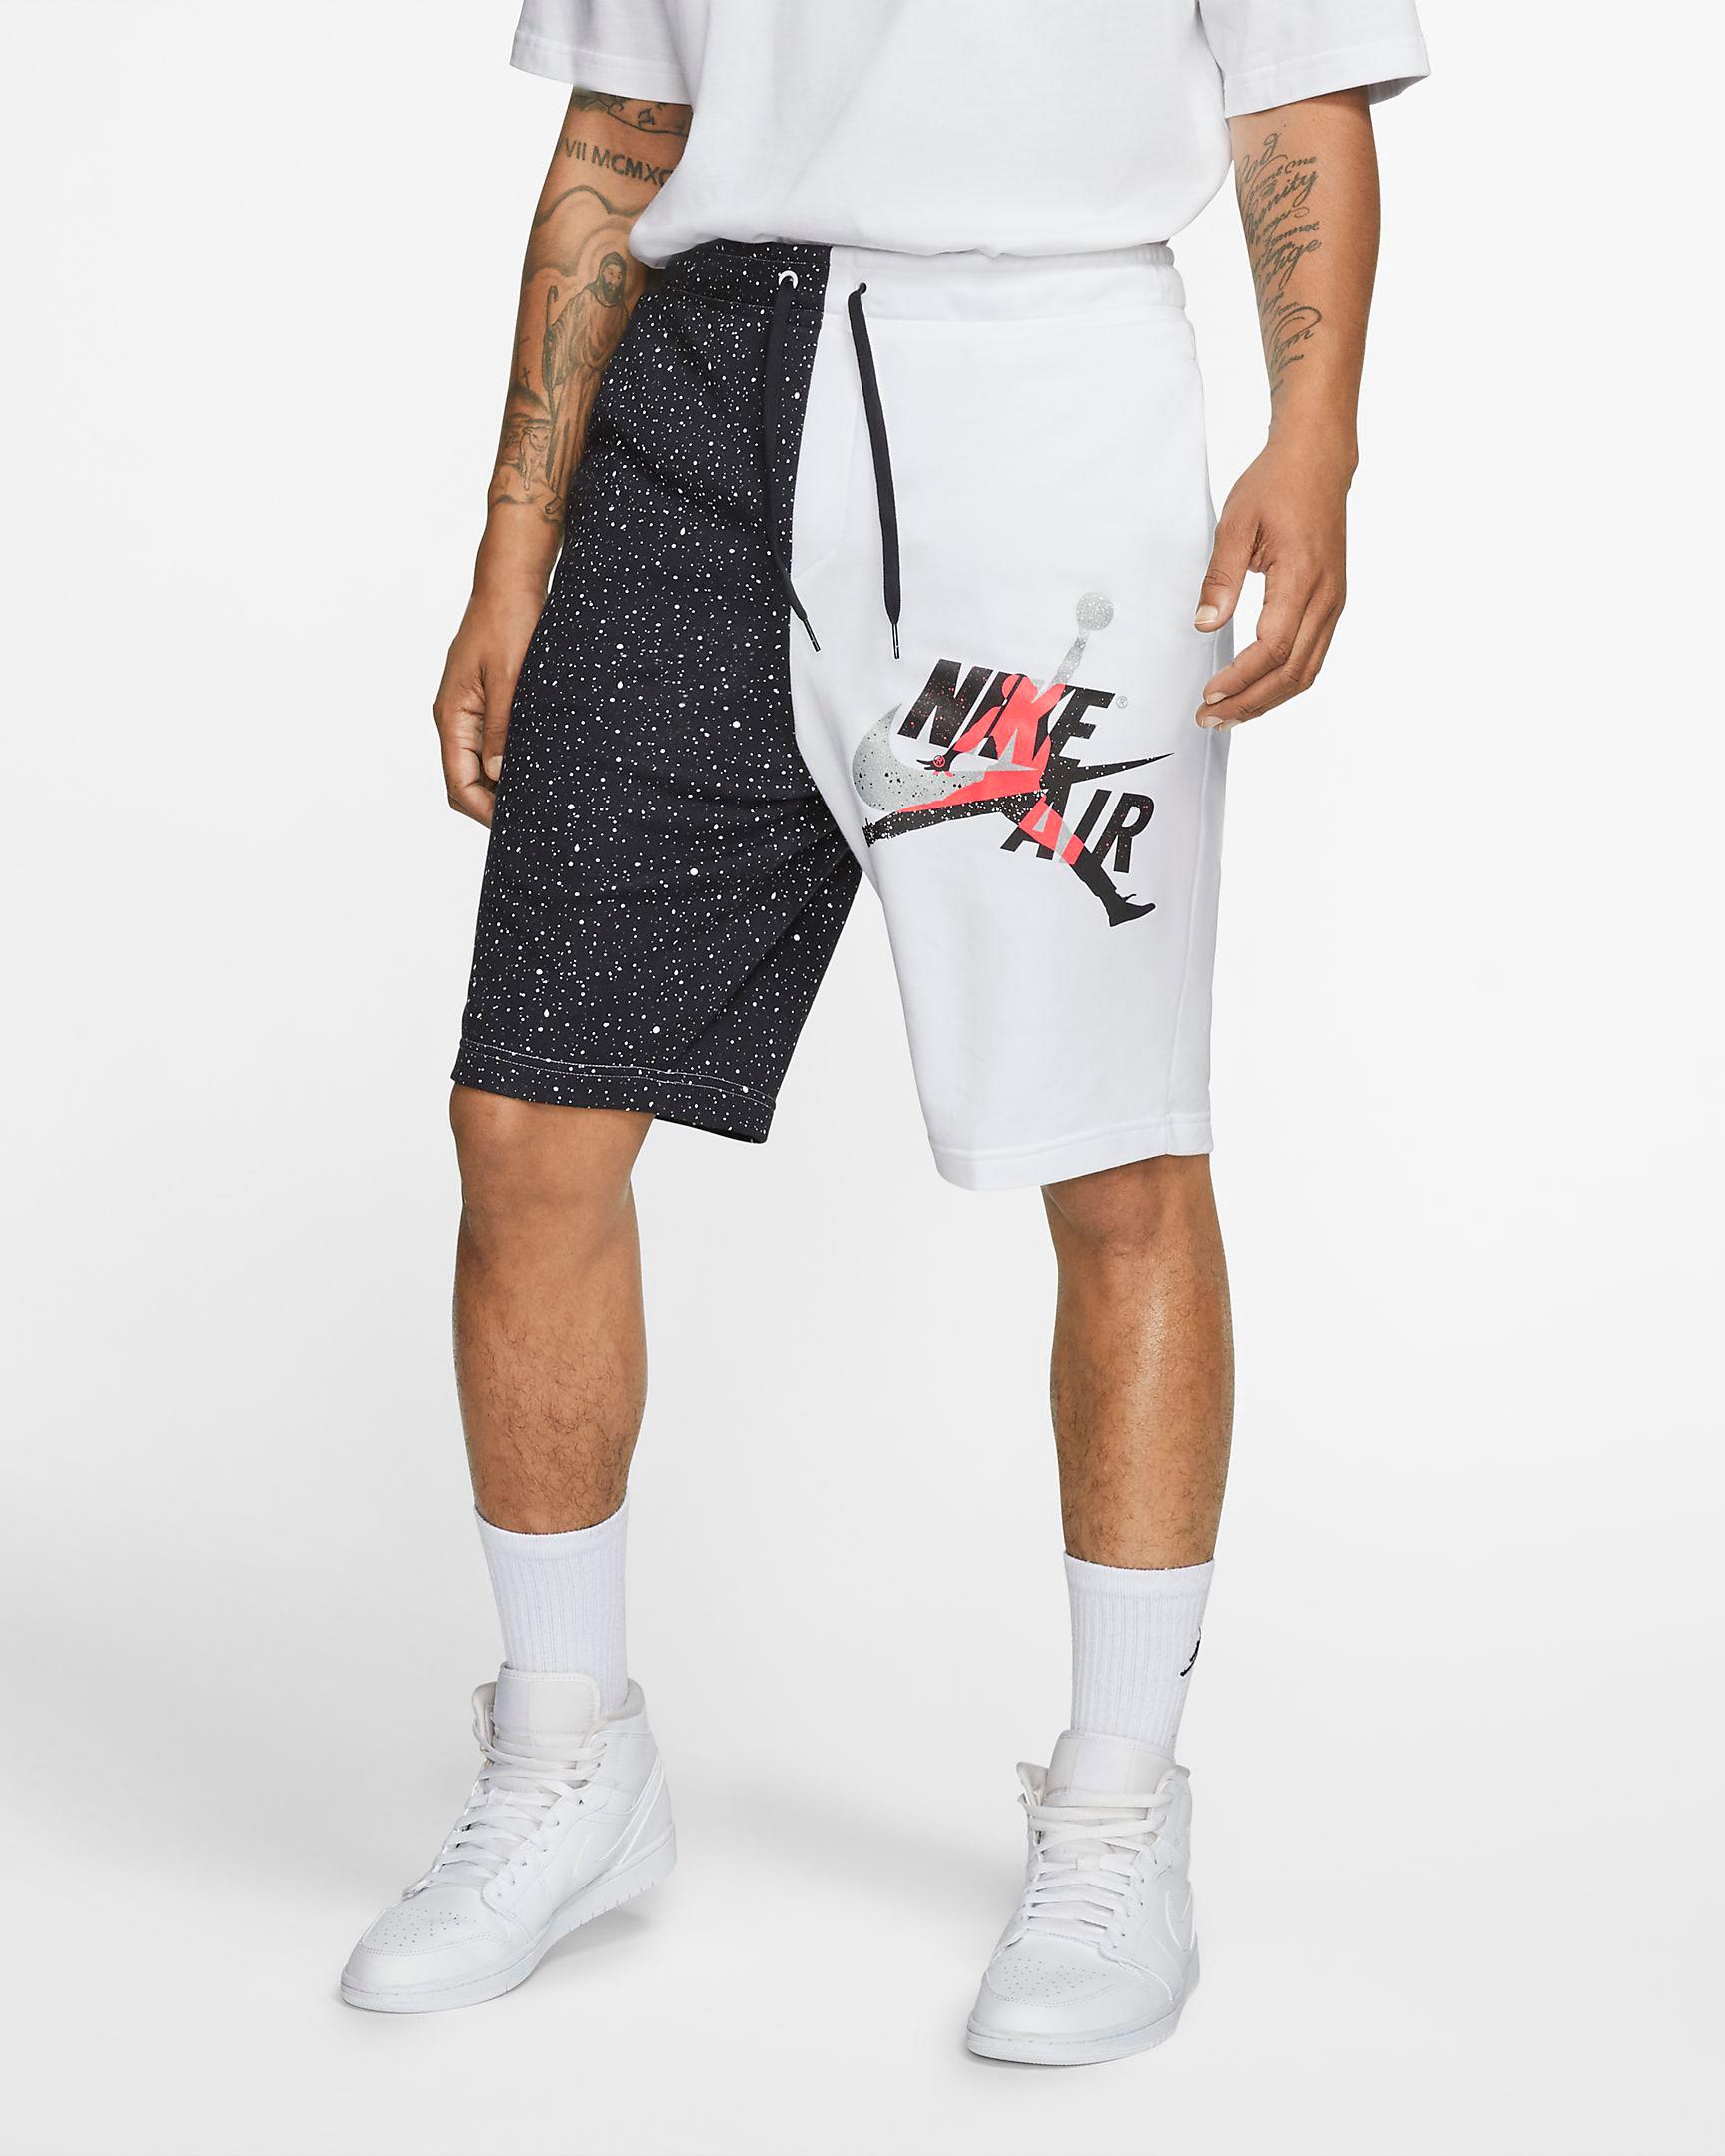 jordan-jumpman-classics-shorts-white-black-infrared